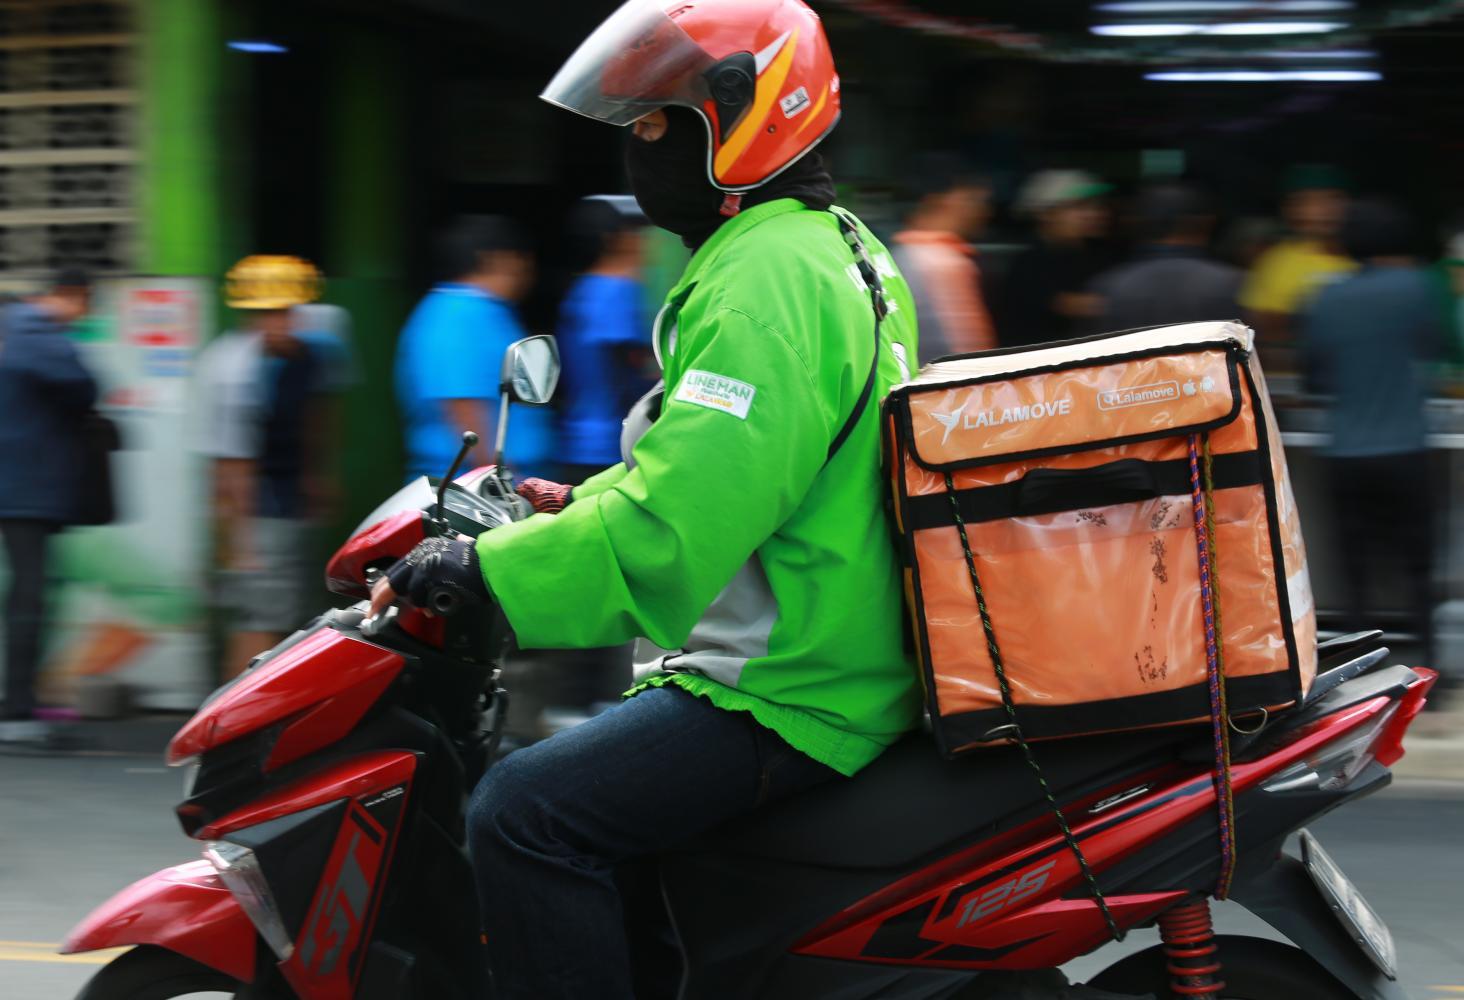 A Line Man driver makes his rounds in Bangkok. Somchai Poomlard